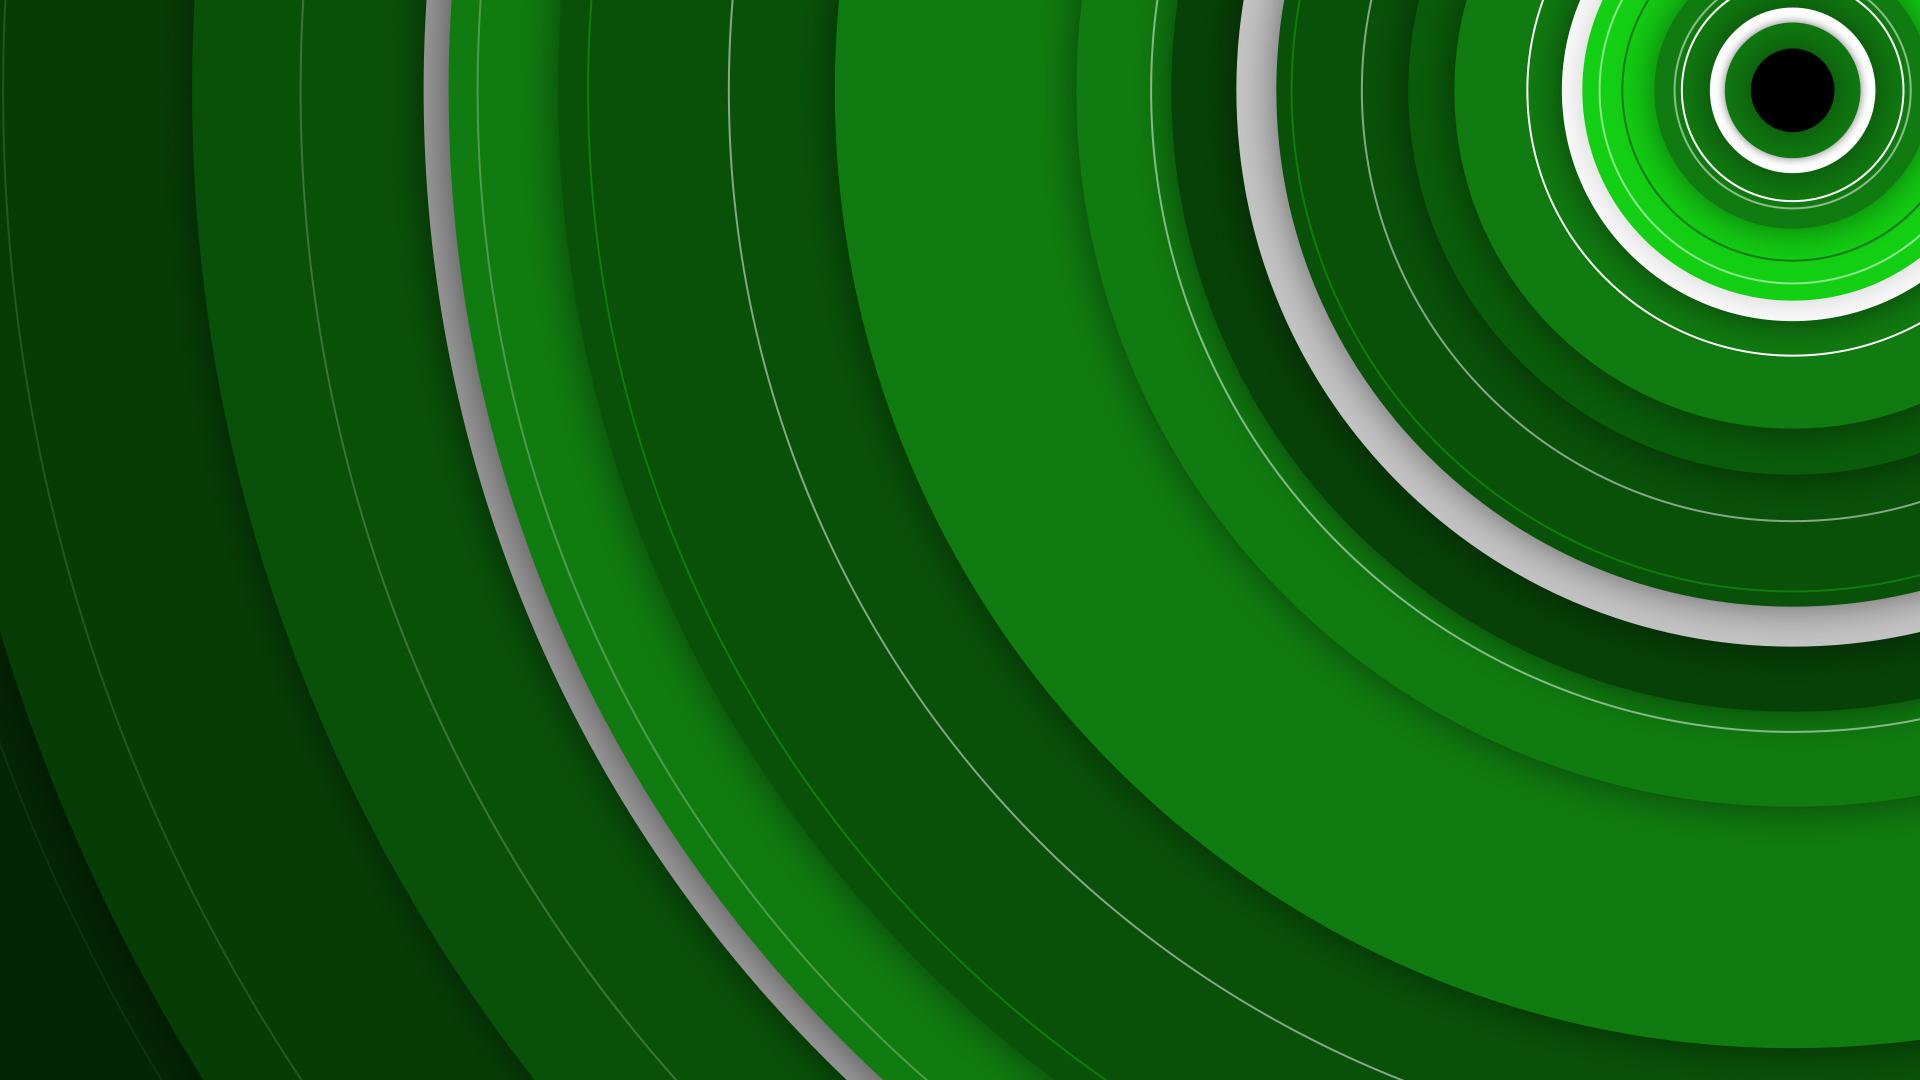 X1bg Circles Green Martin Crownover